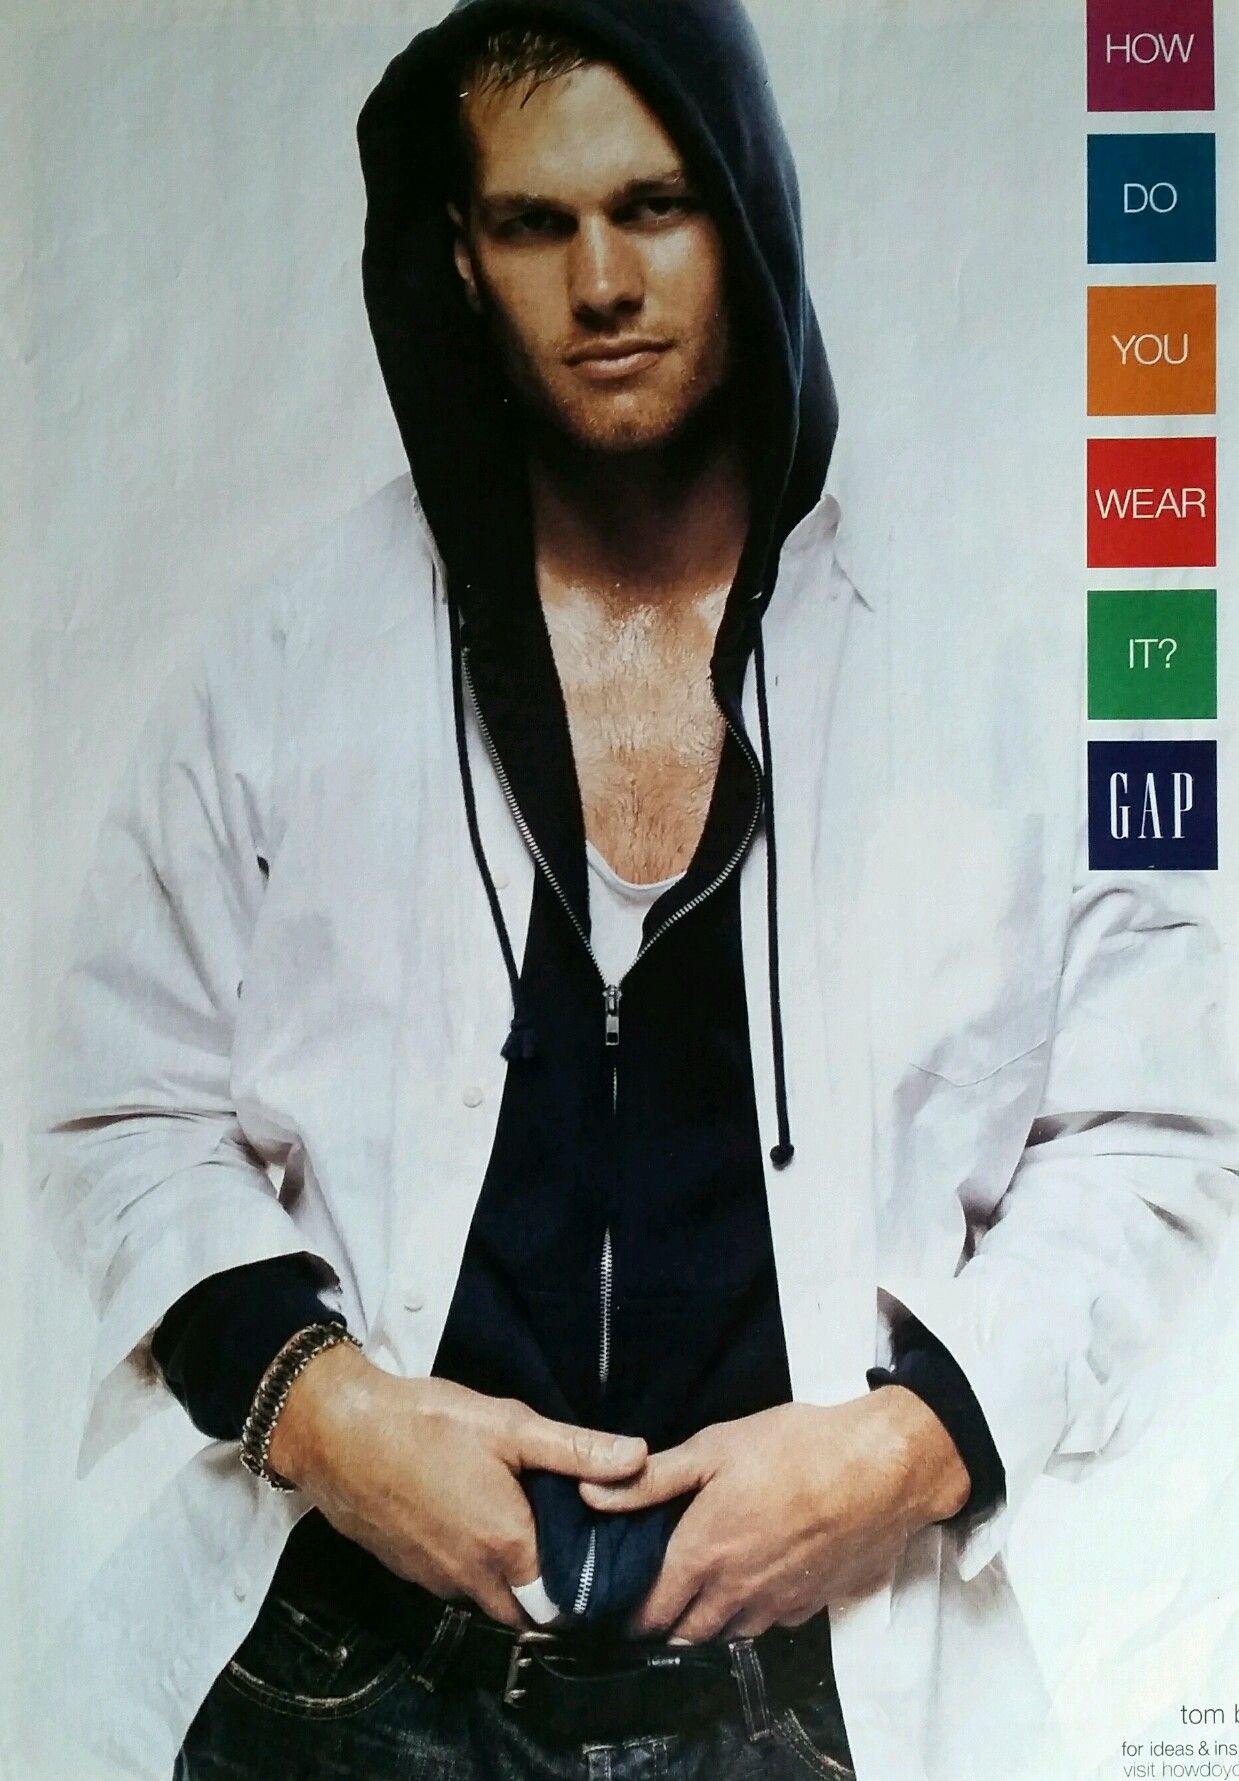 Quarterback Tom Brady For The Gap 2004 Nfl Newenglandpatriots Hoody Mens Fashion Magazine Cover New England Patriots [ 1781 x 1239 Pixel ]